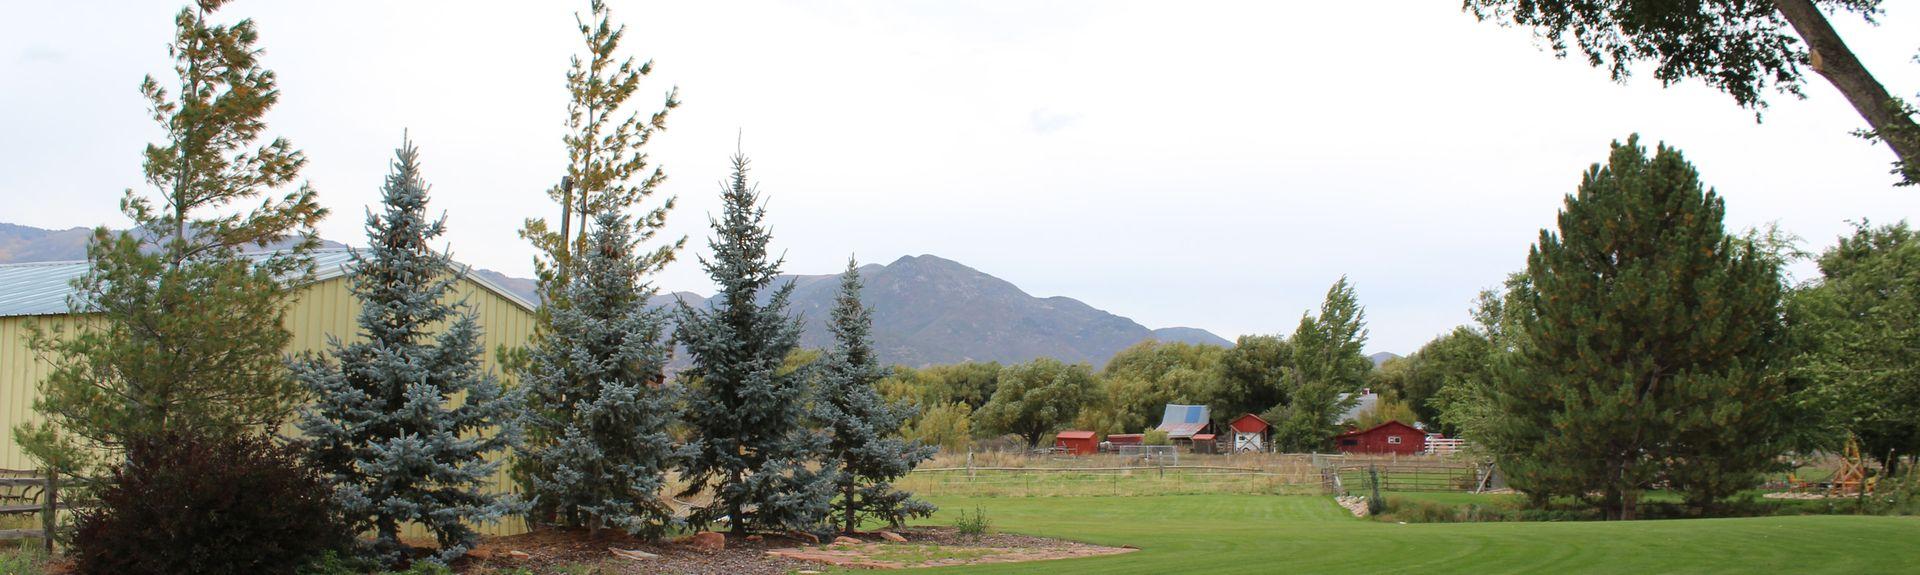 Provo Utah (temppeli), Provo, Utah, Yhdysvallat